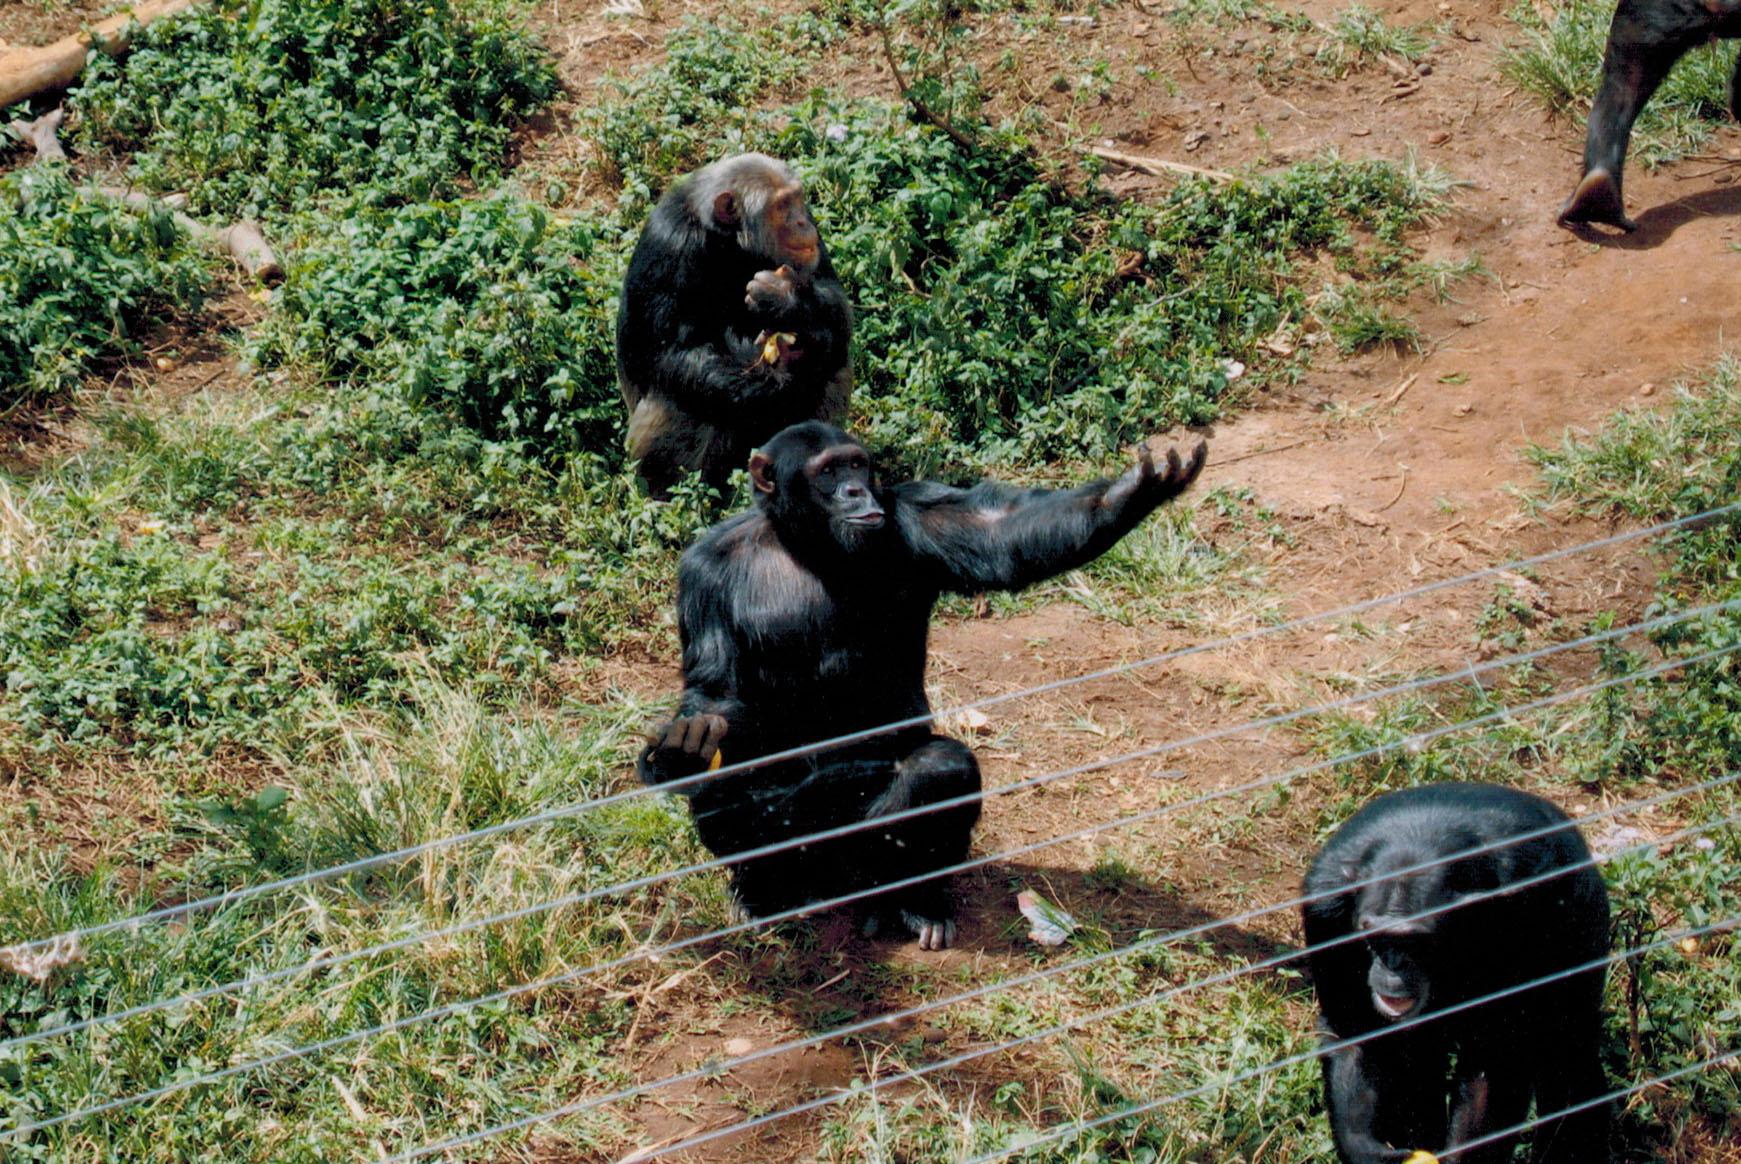 Chimpanzees at feeding time on Ngamba Island in Uganda